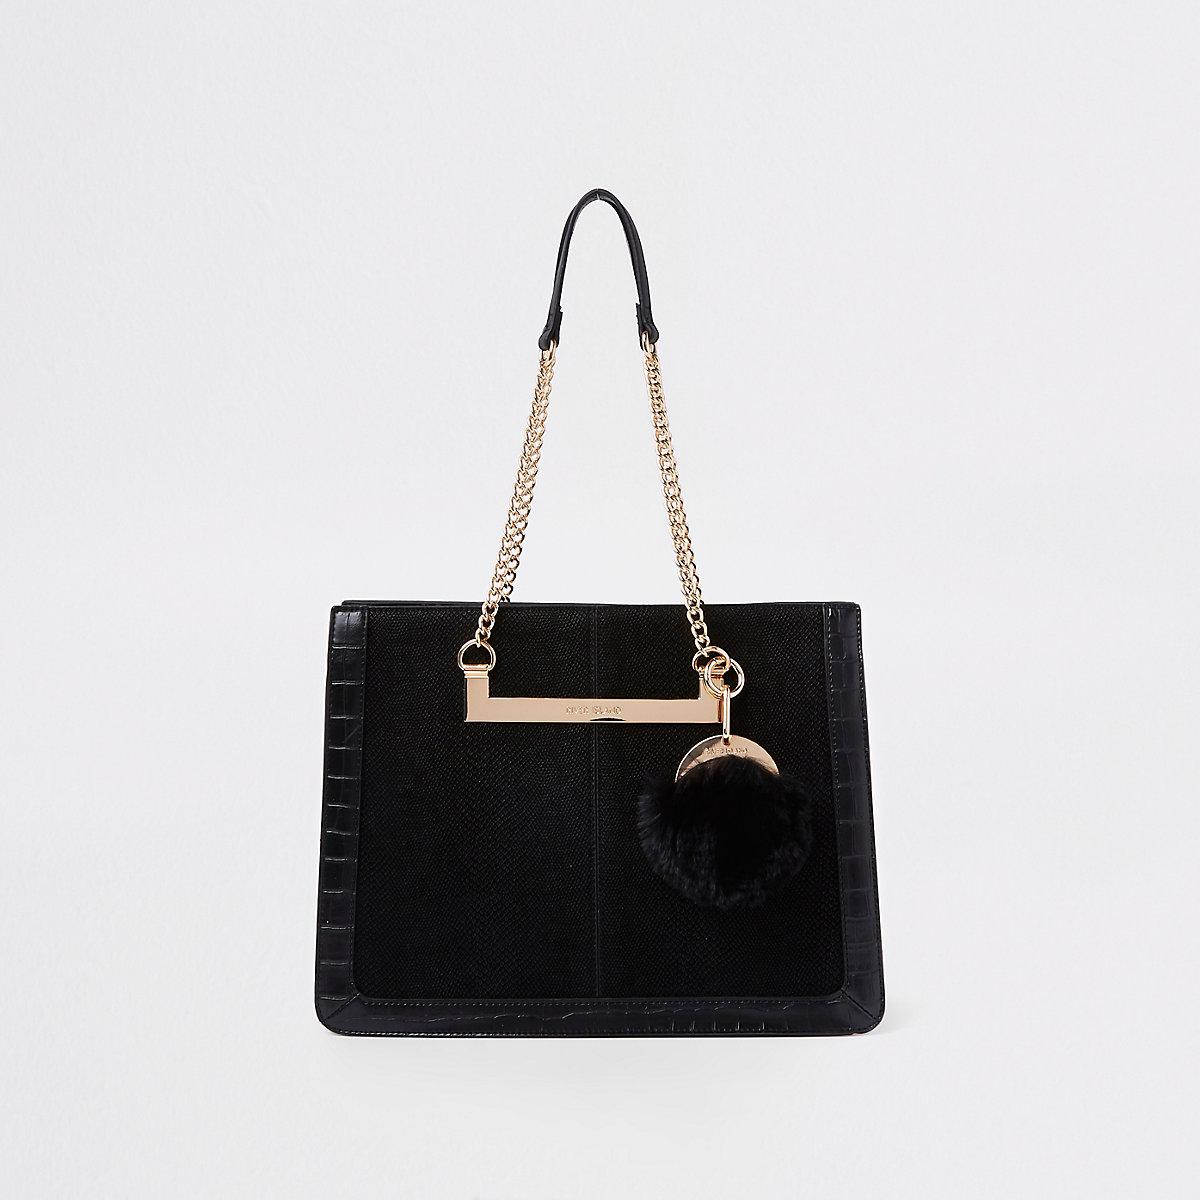 Black chain handle pom pom tote bag